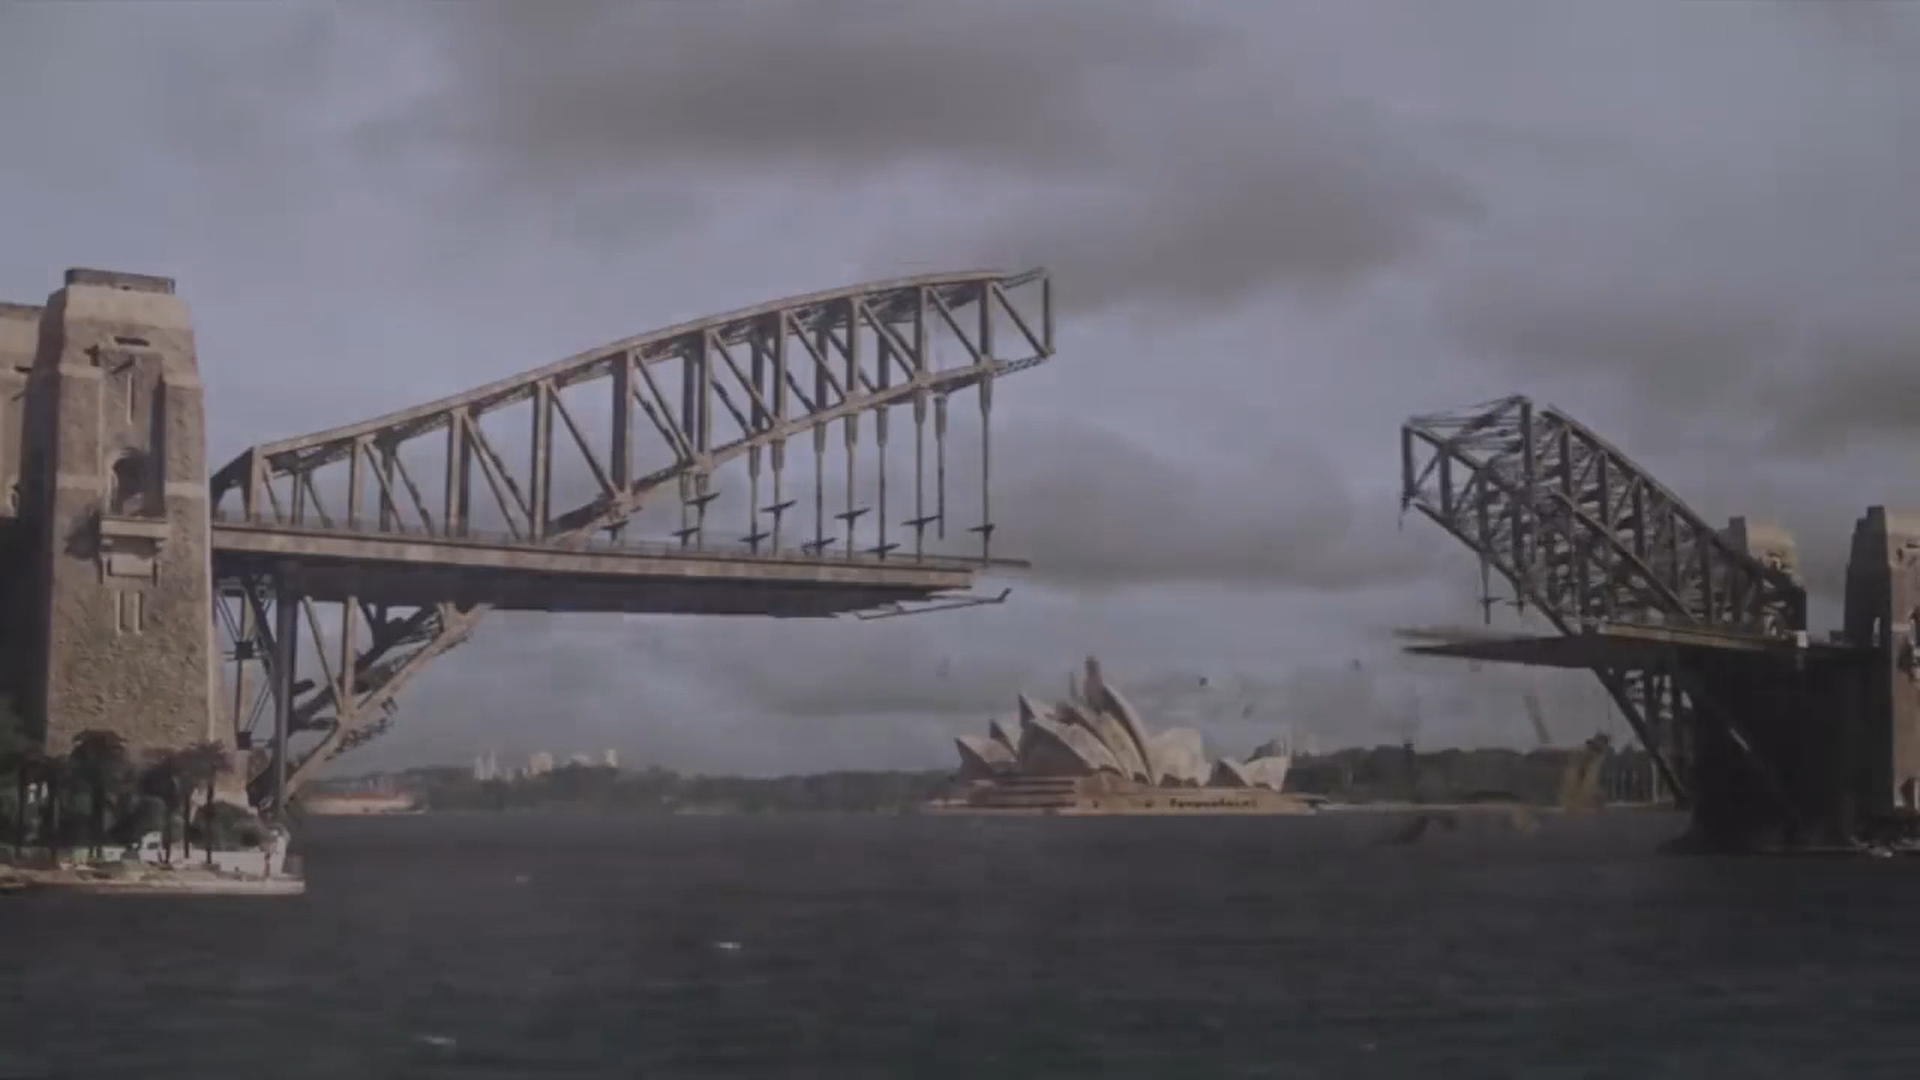 sydney harbour bridge life after people wiki